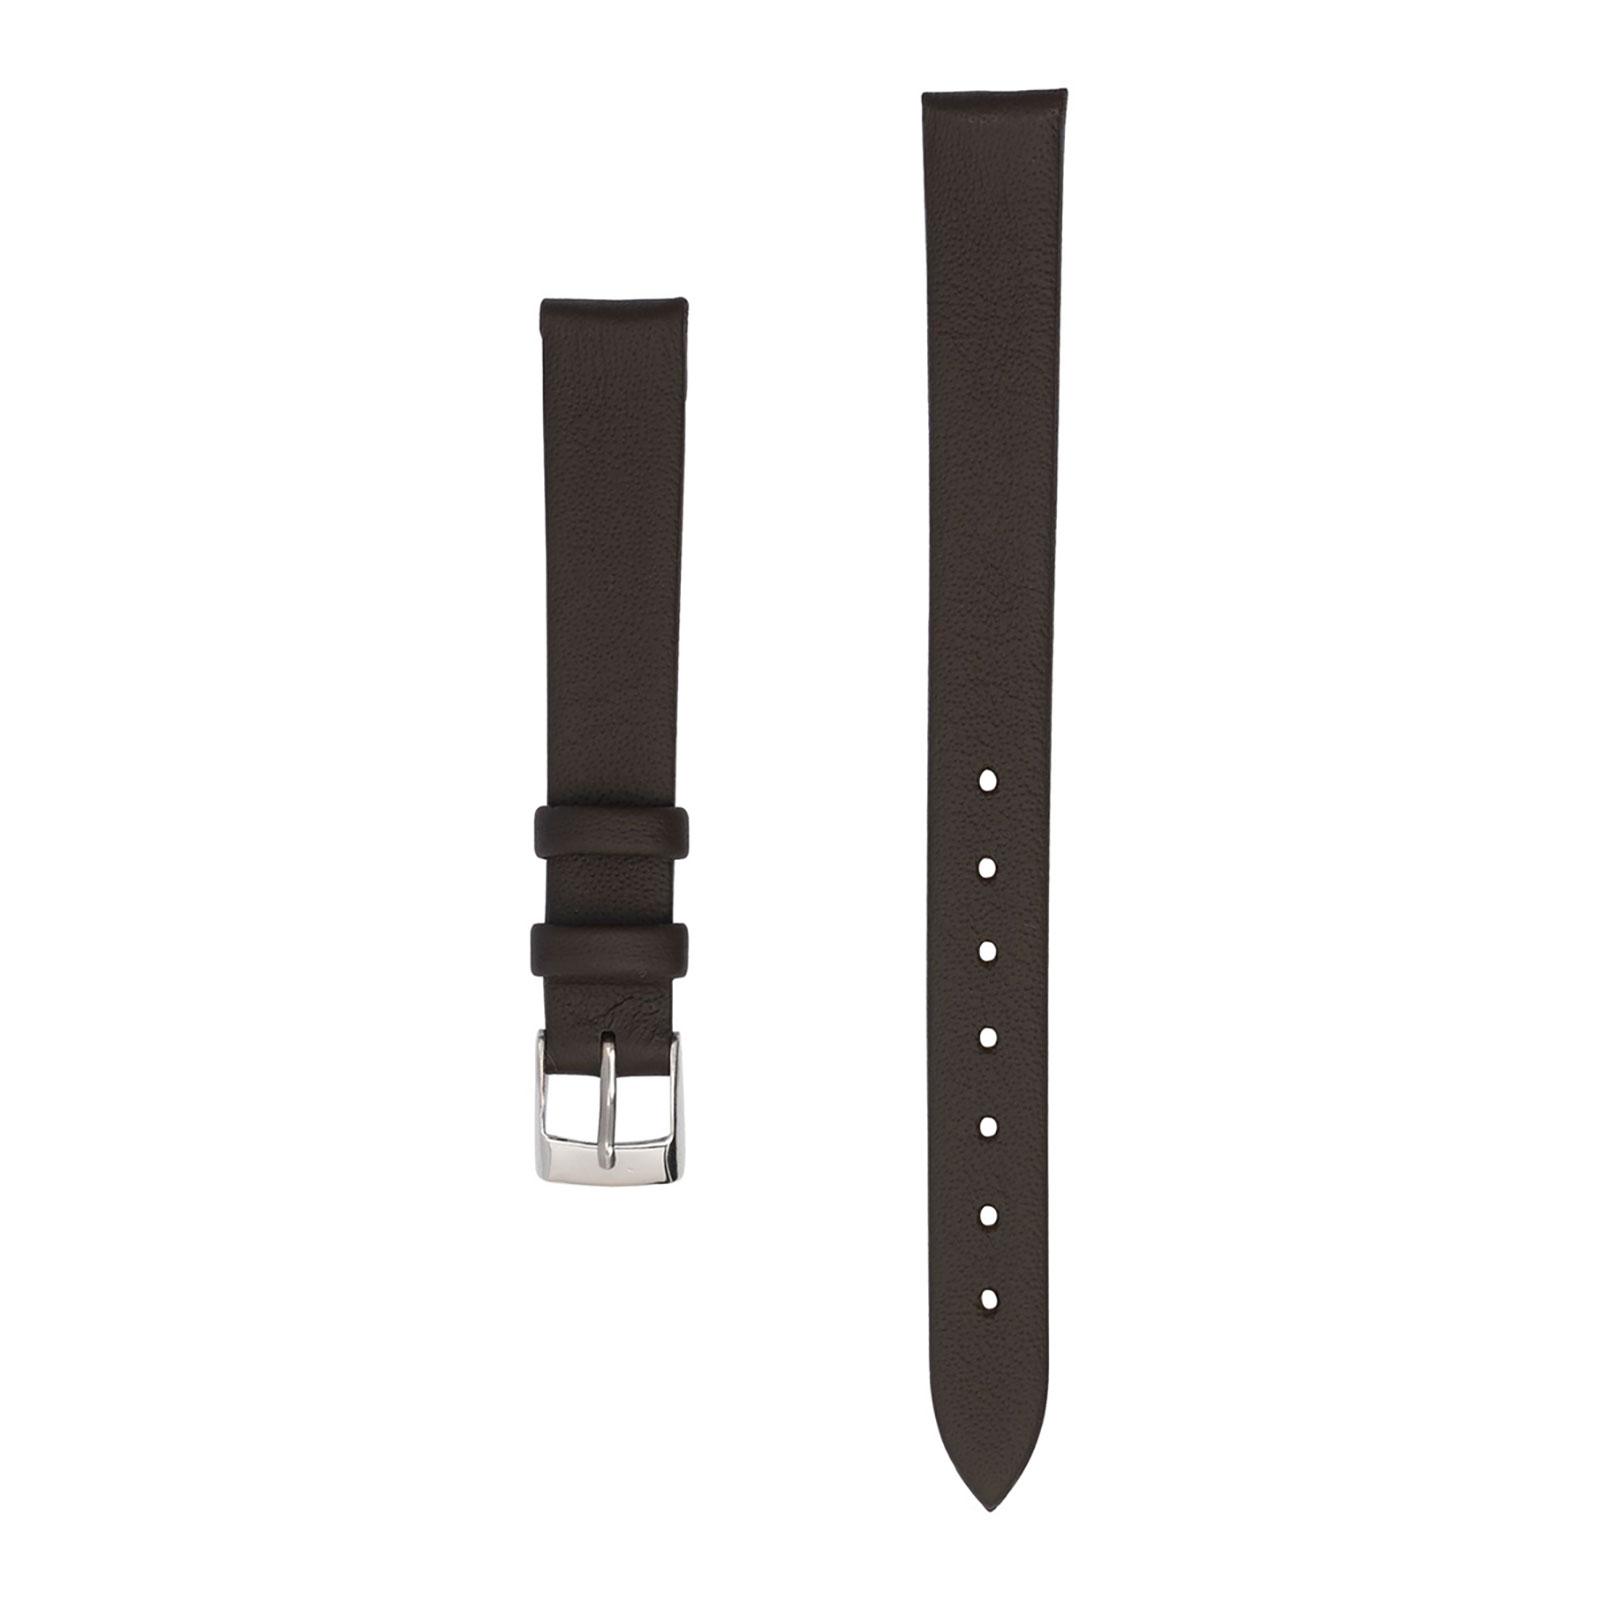 Klockarmband 12 mm - brunt läder